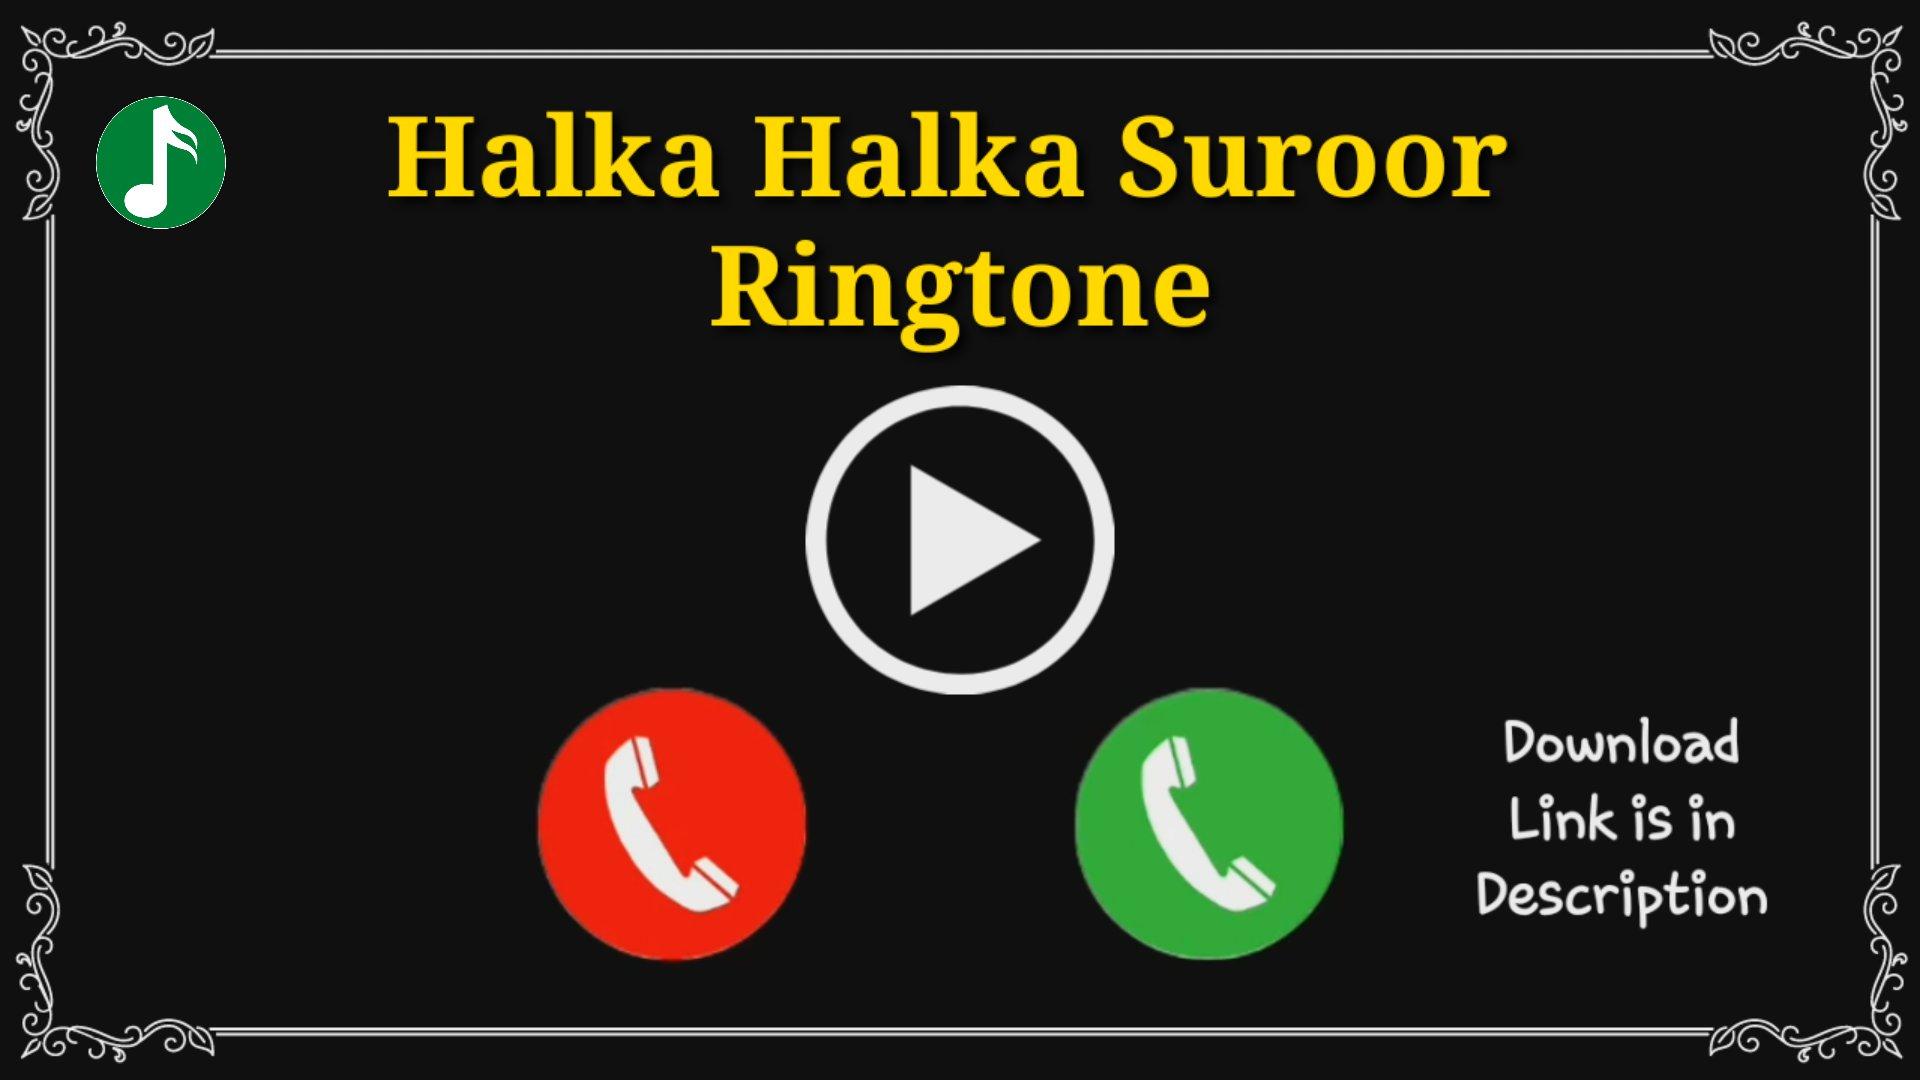 Halka Halka Suroor Mp3 Ringtone Download